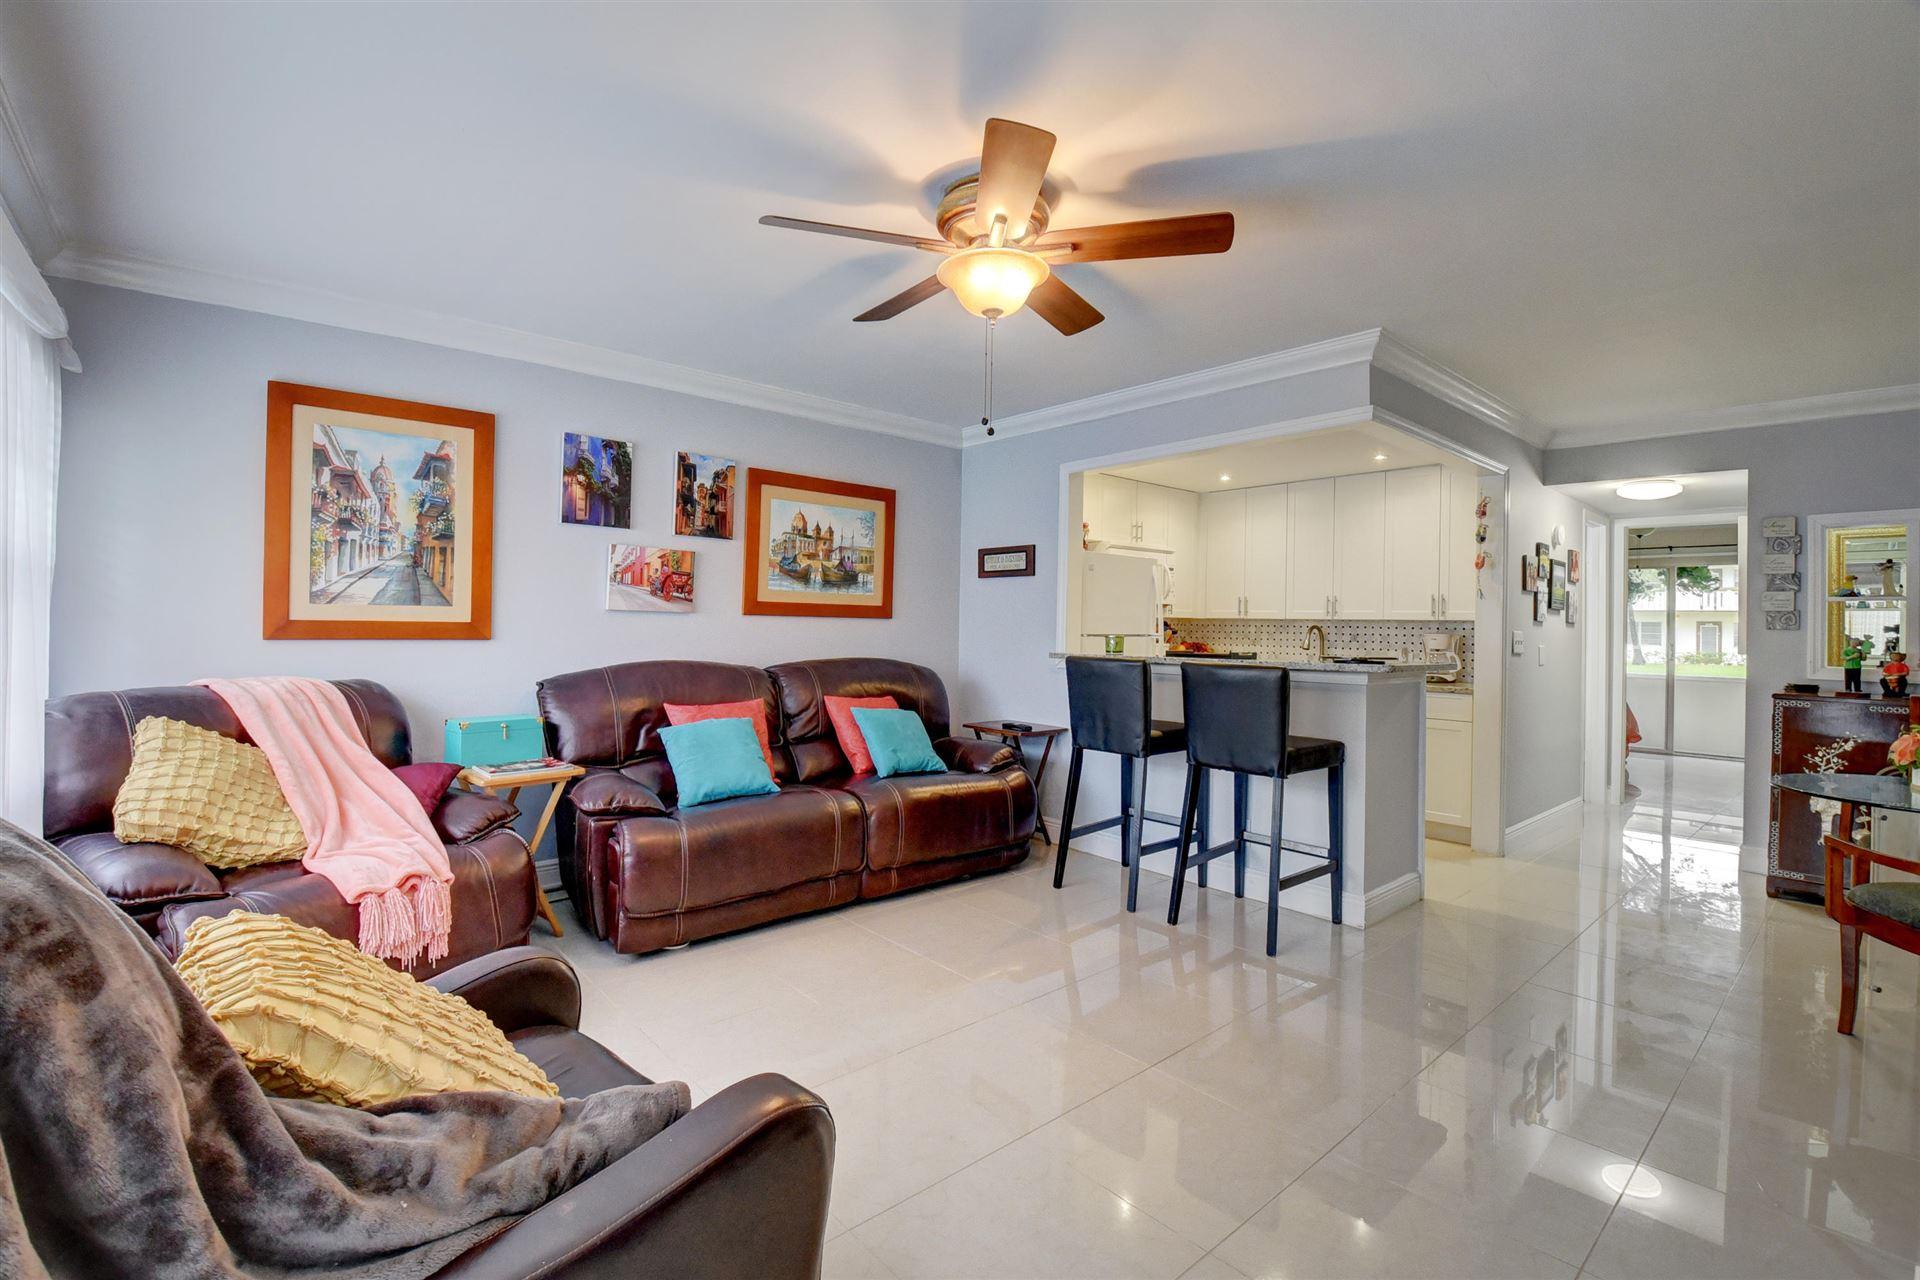 343 Mansfield I, Boca Raton, FL 33434 - #: RX-10641461